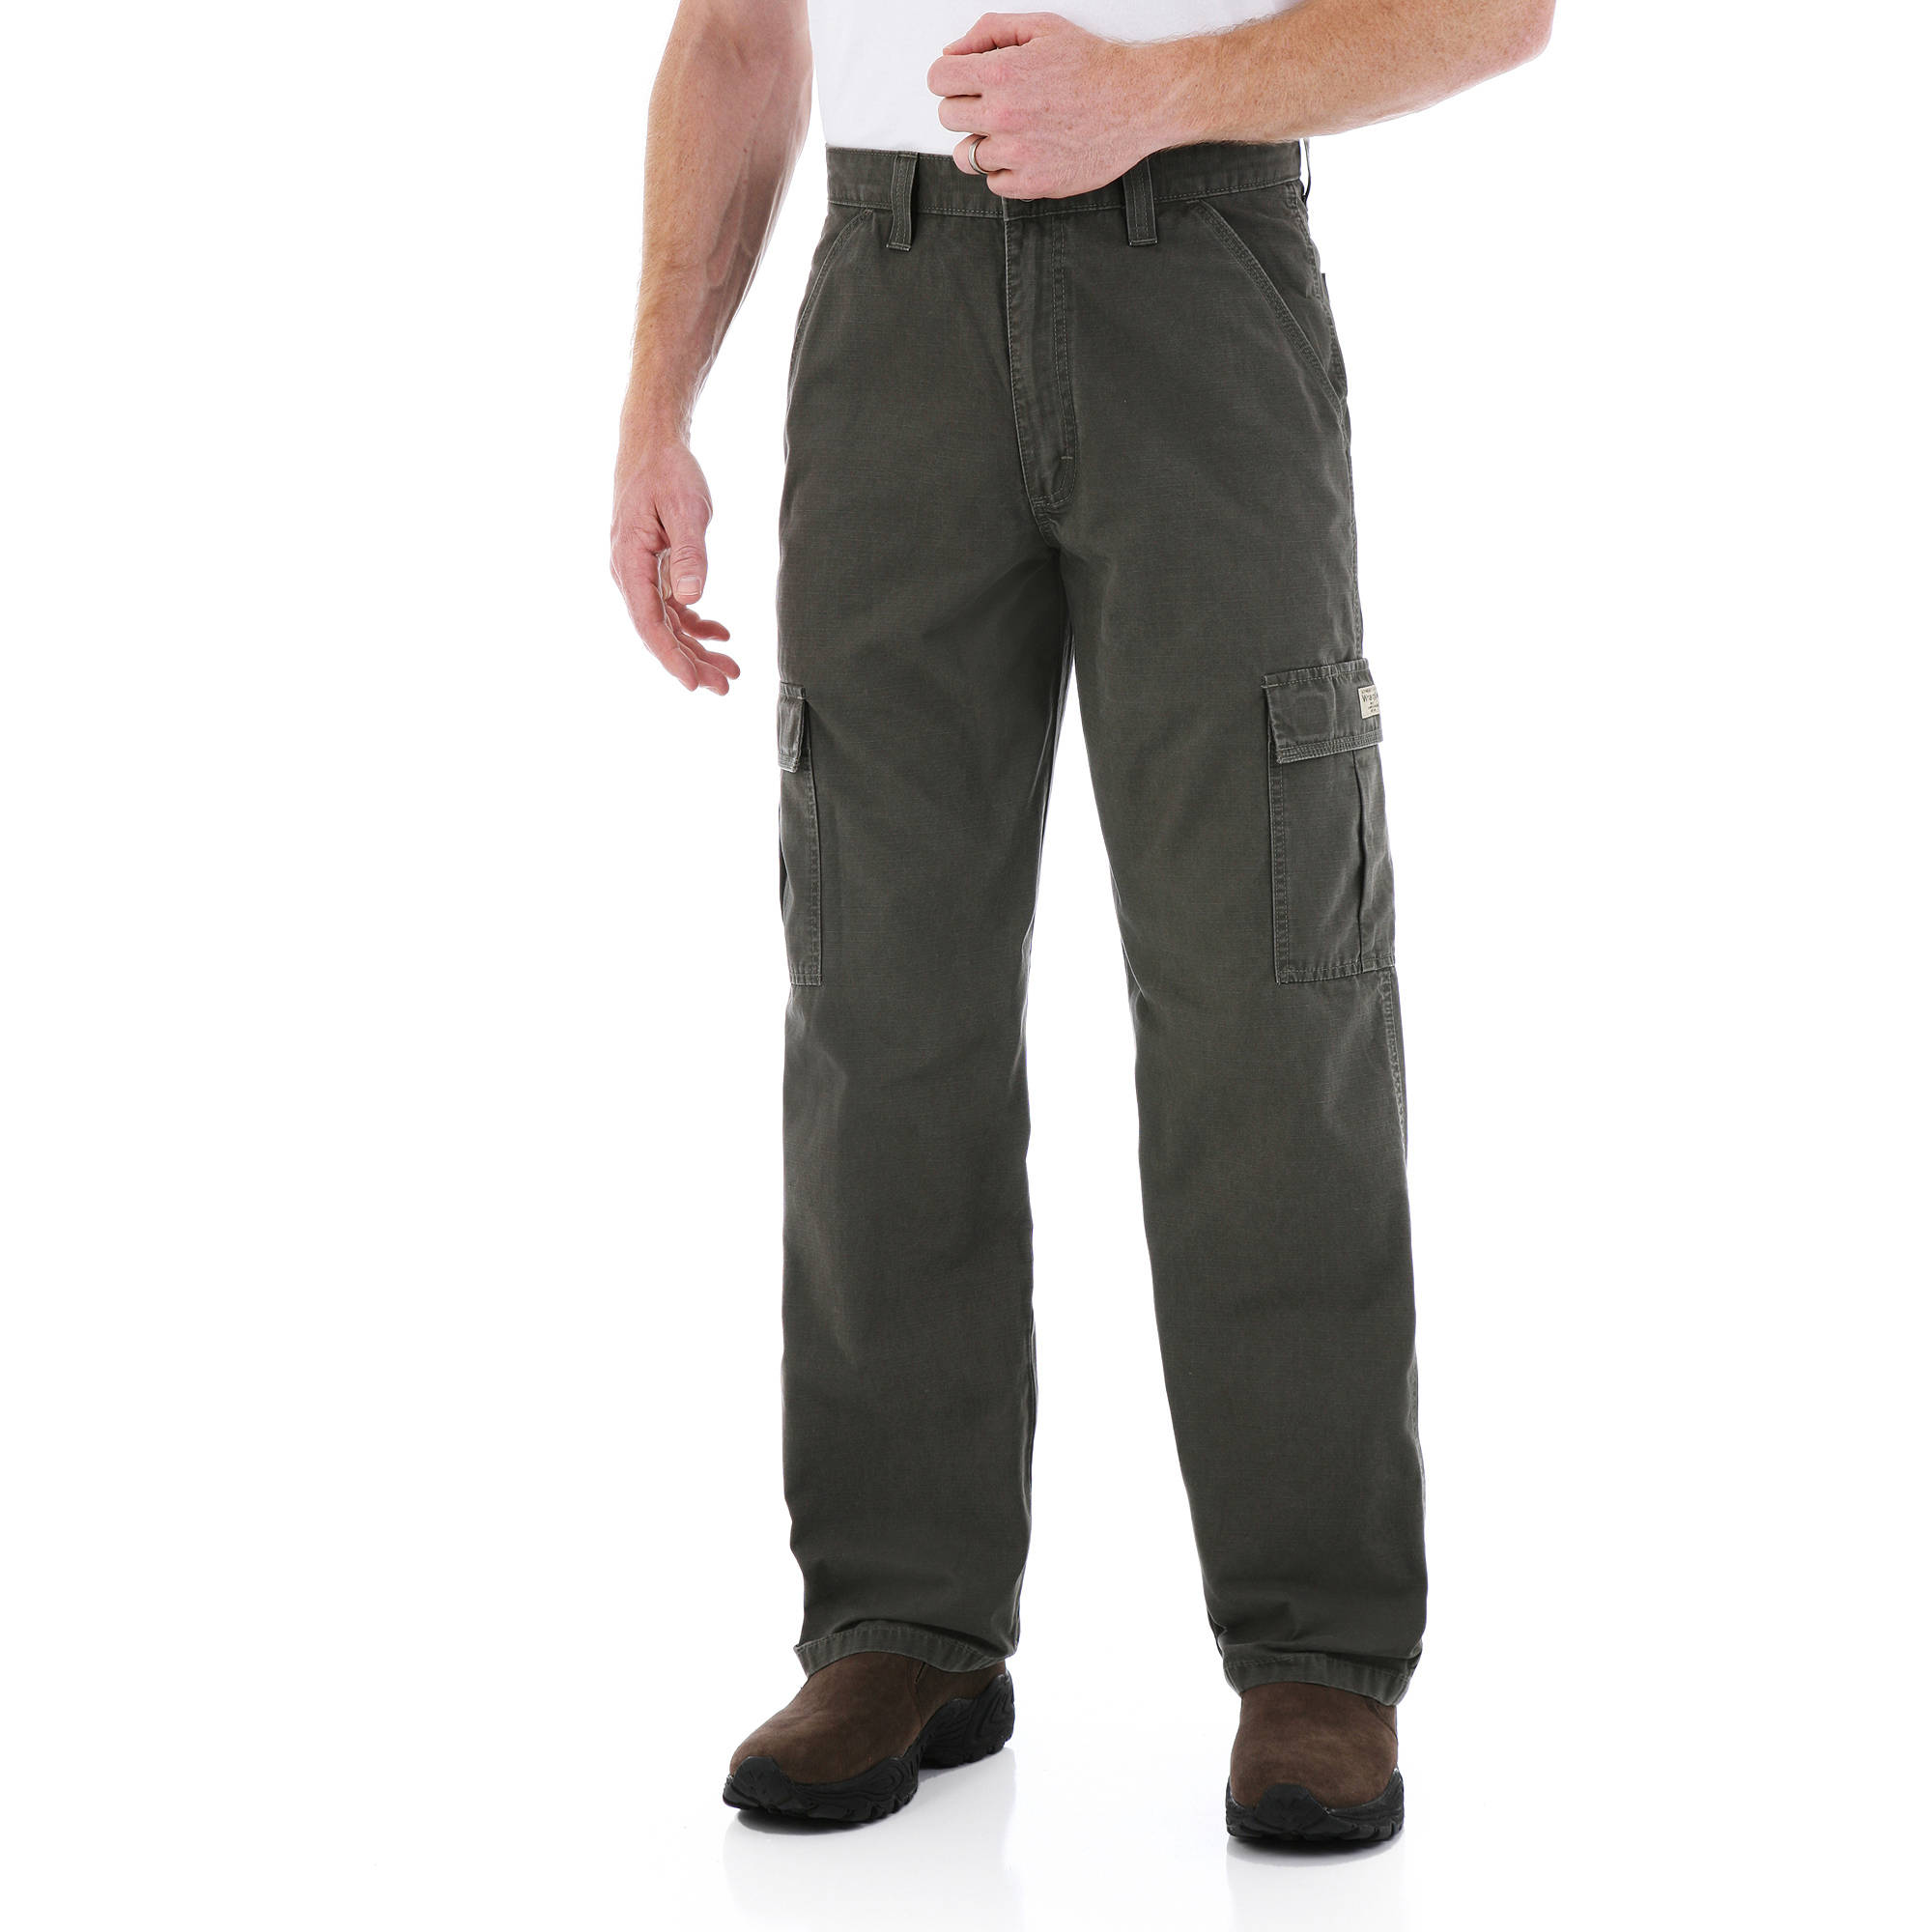 Wrangler Men's Rip-Stop Cargo Pant - Walmart.com